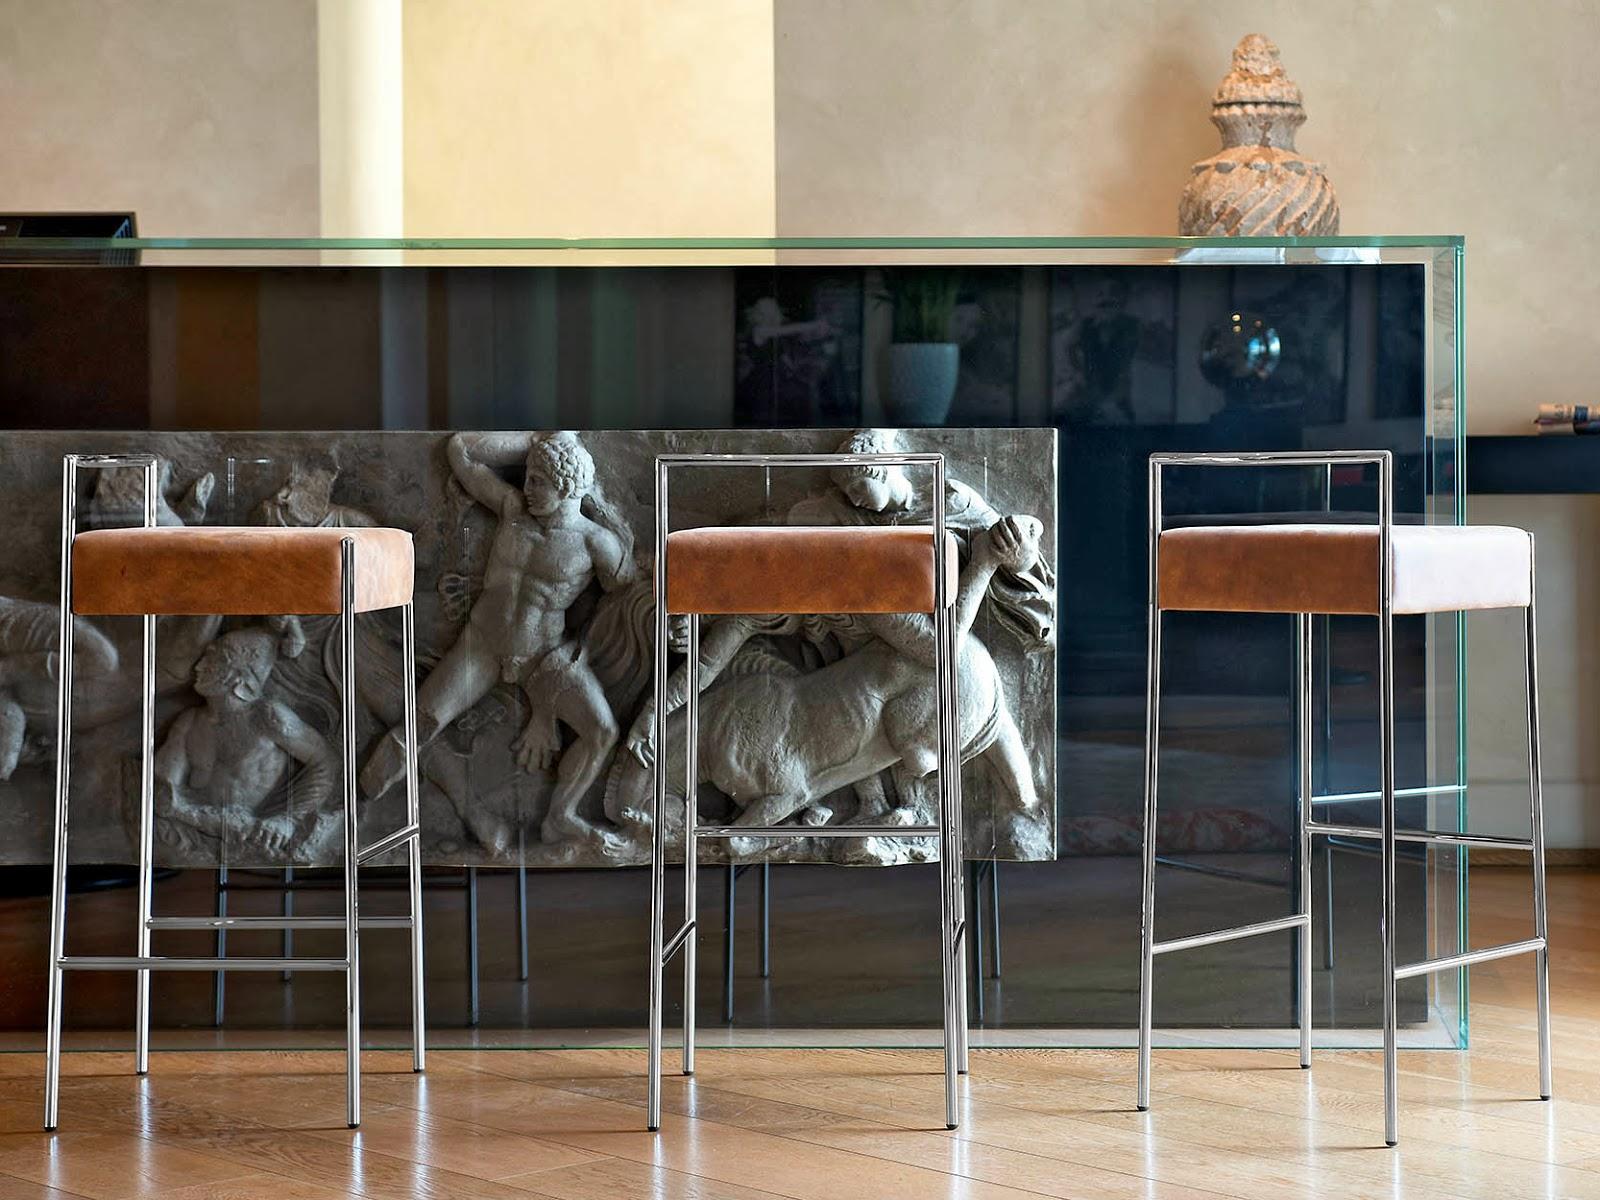 Tavolo e sgabelli da bar a napoli kijiji annunci di ebay